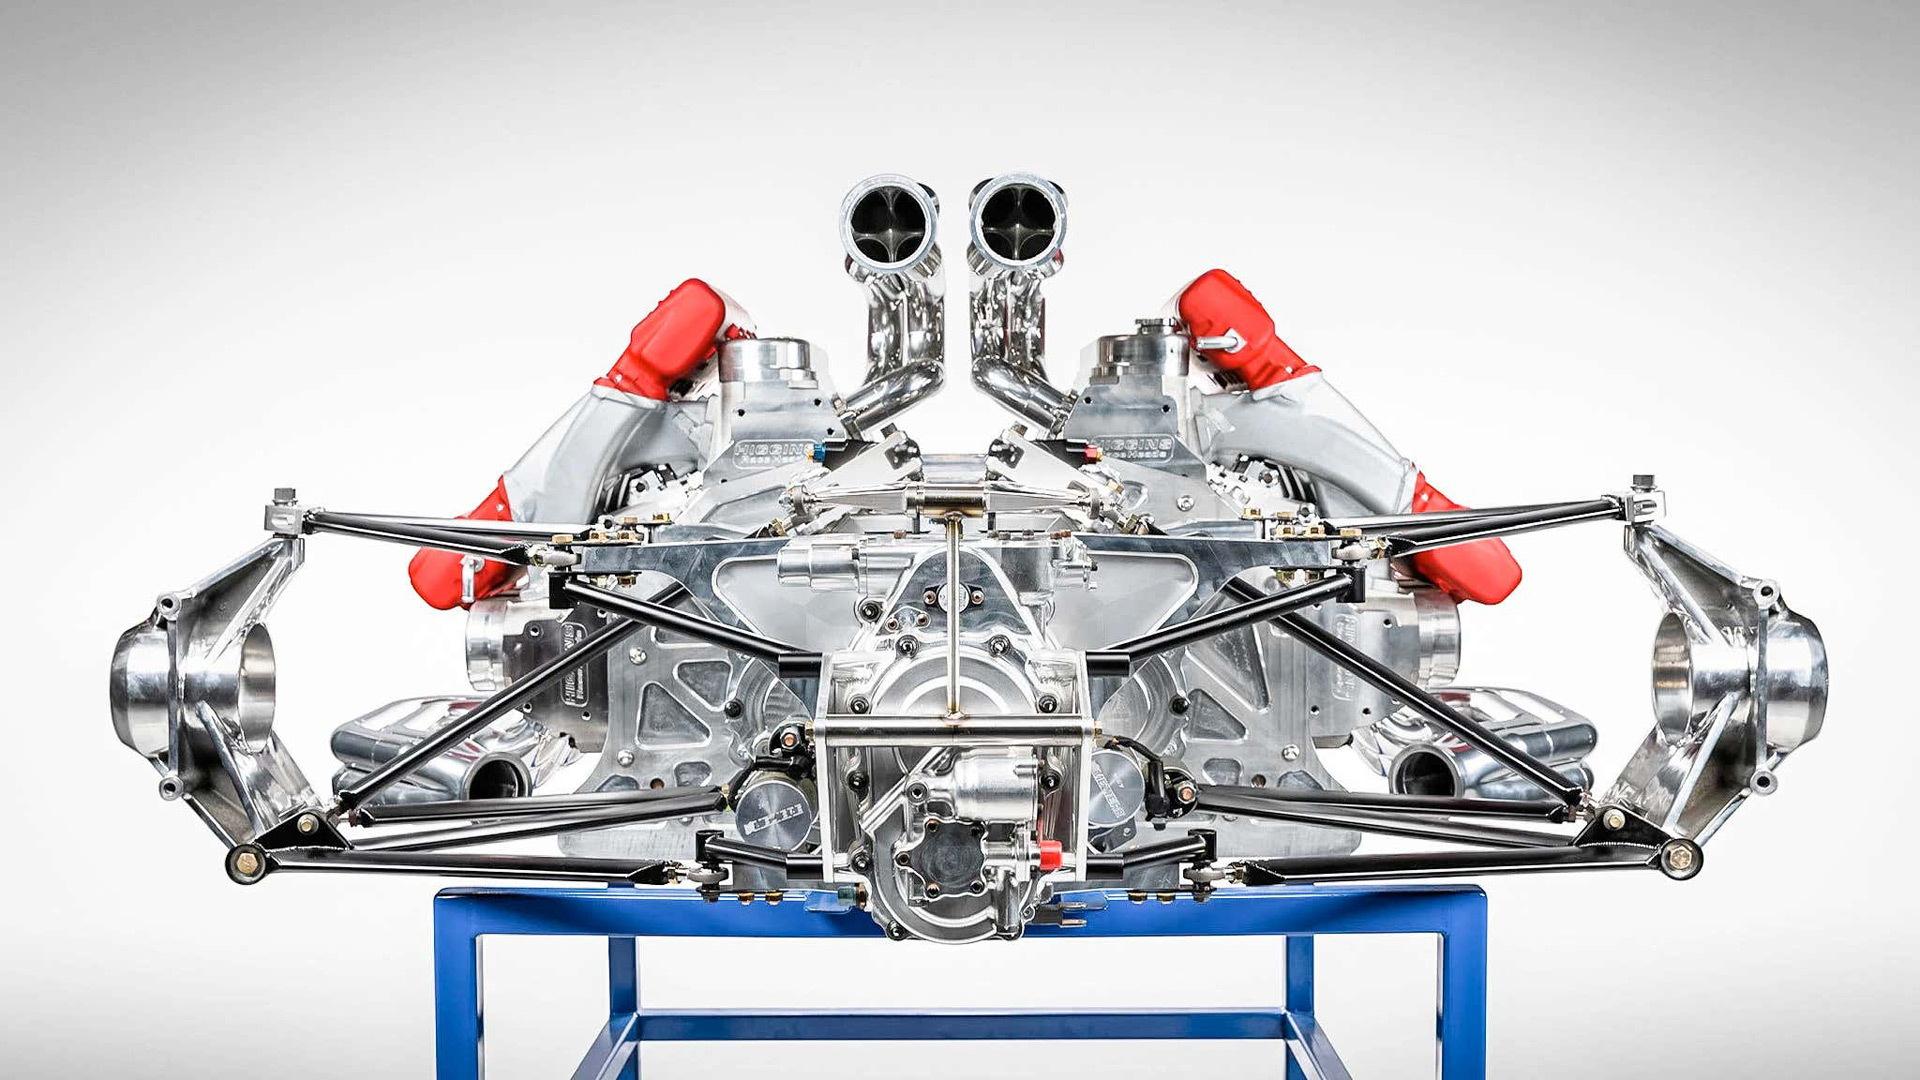 HAL W-16 engine